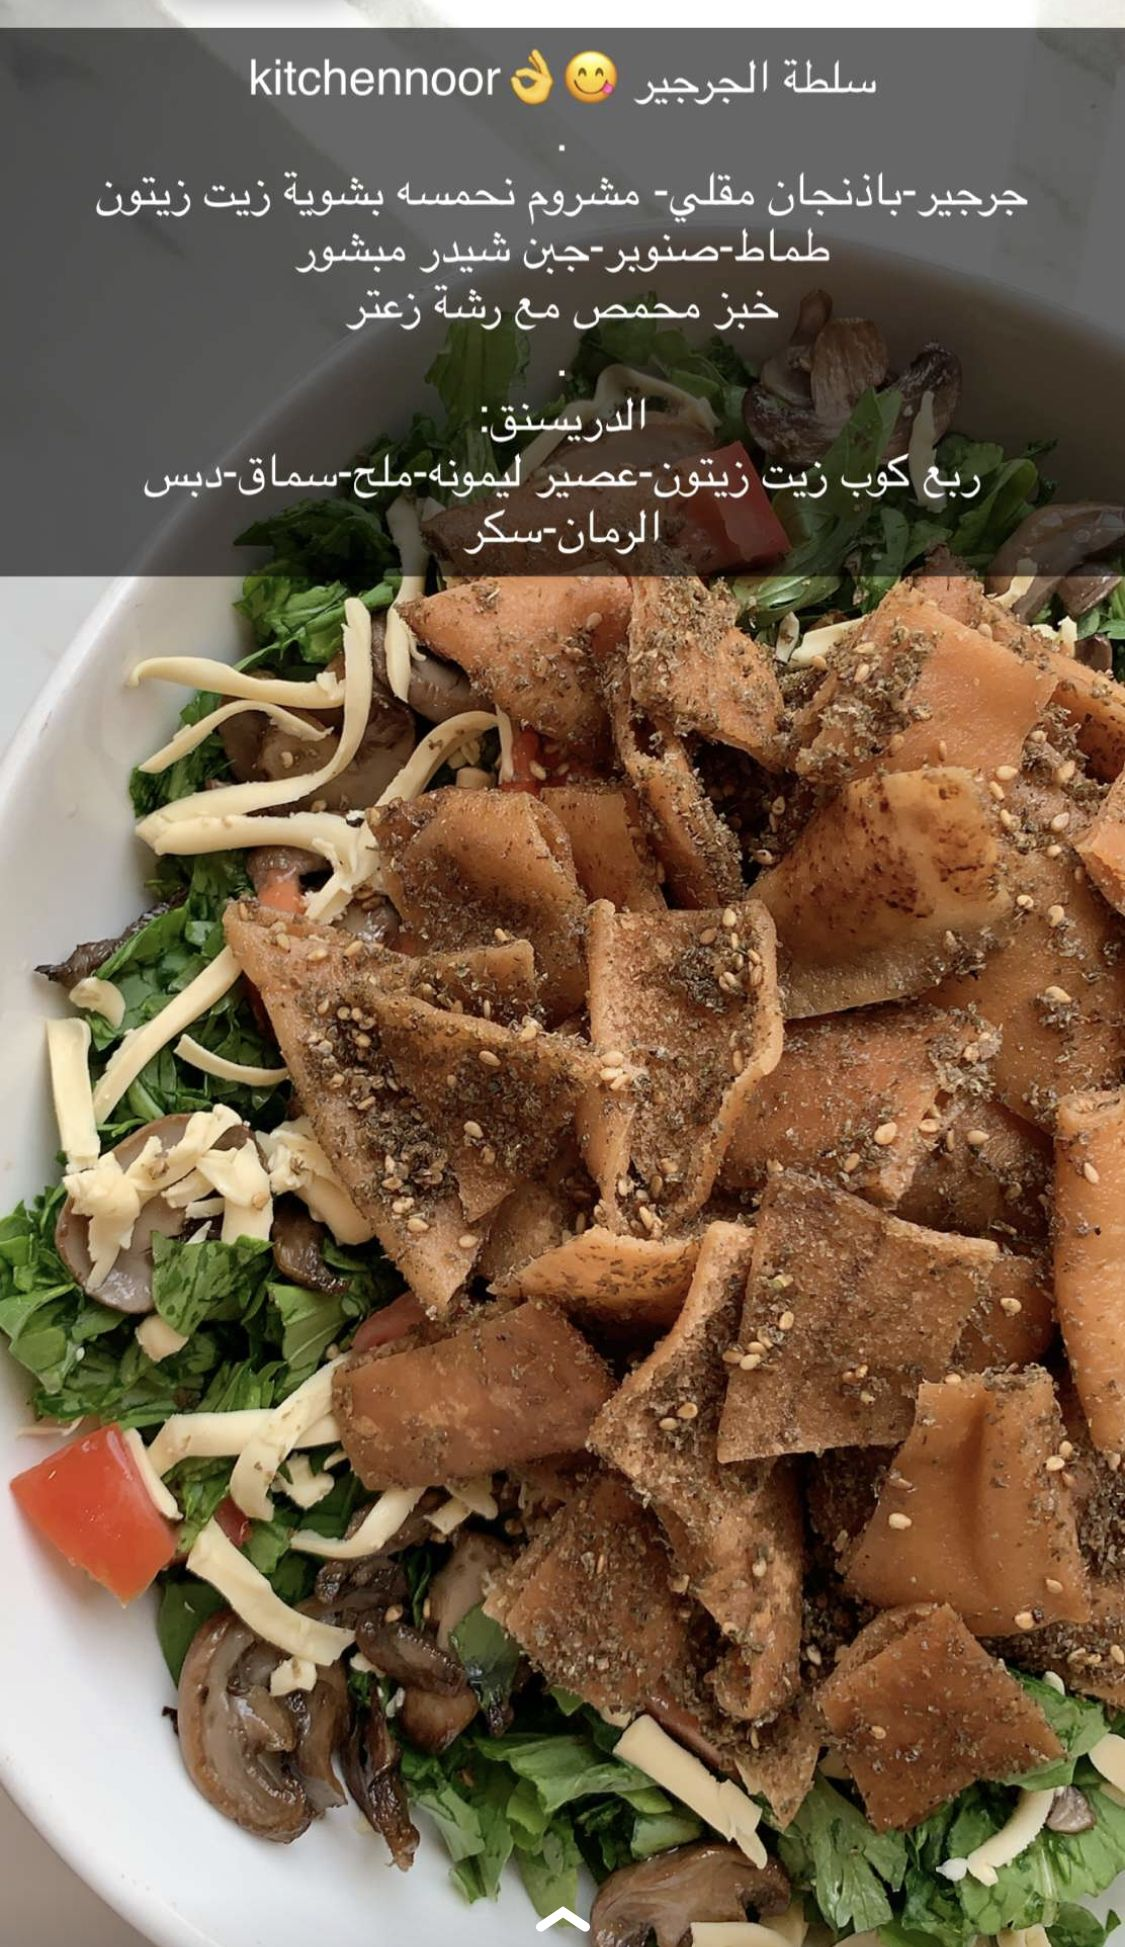 Pin By Bnt Almalki On اطباق سهلة وسريعة للمناسبات Food Meat Chicken